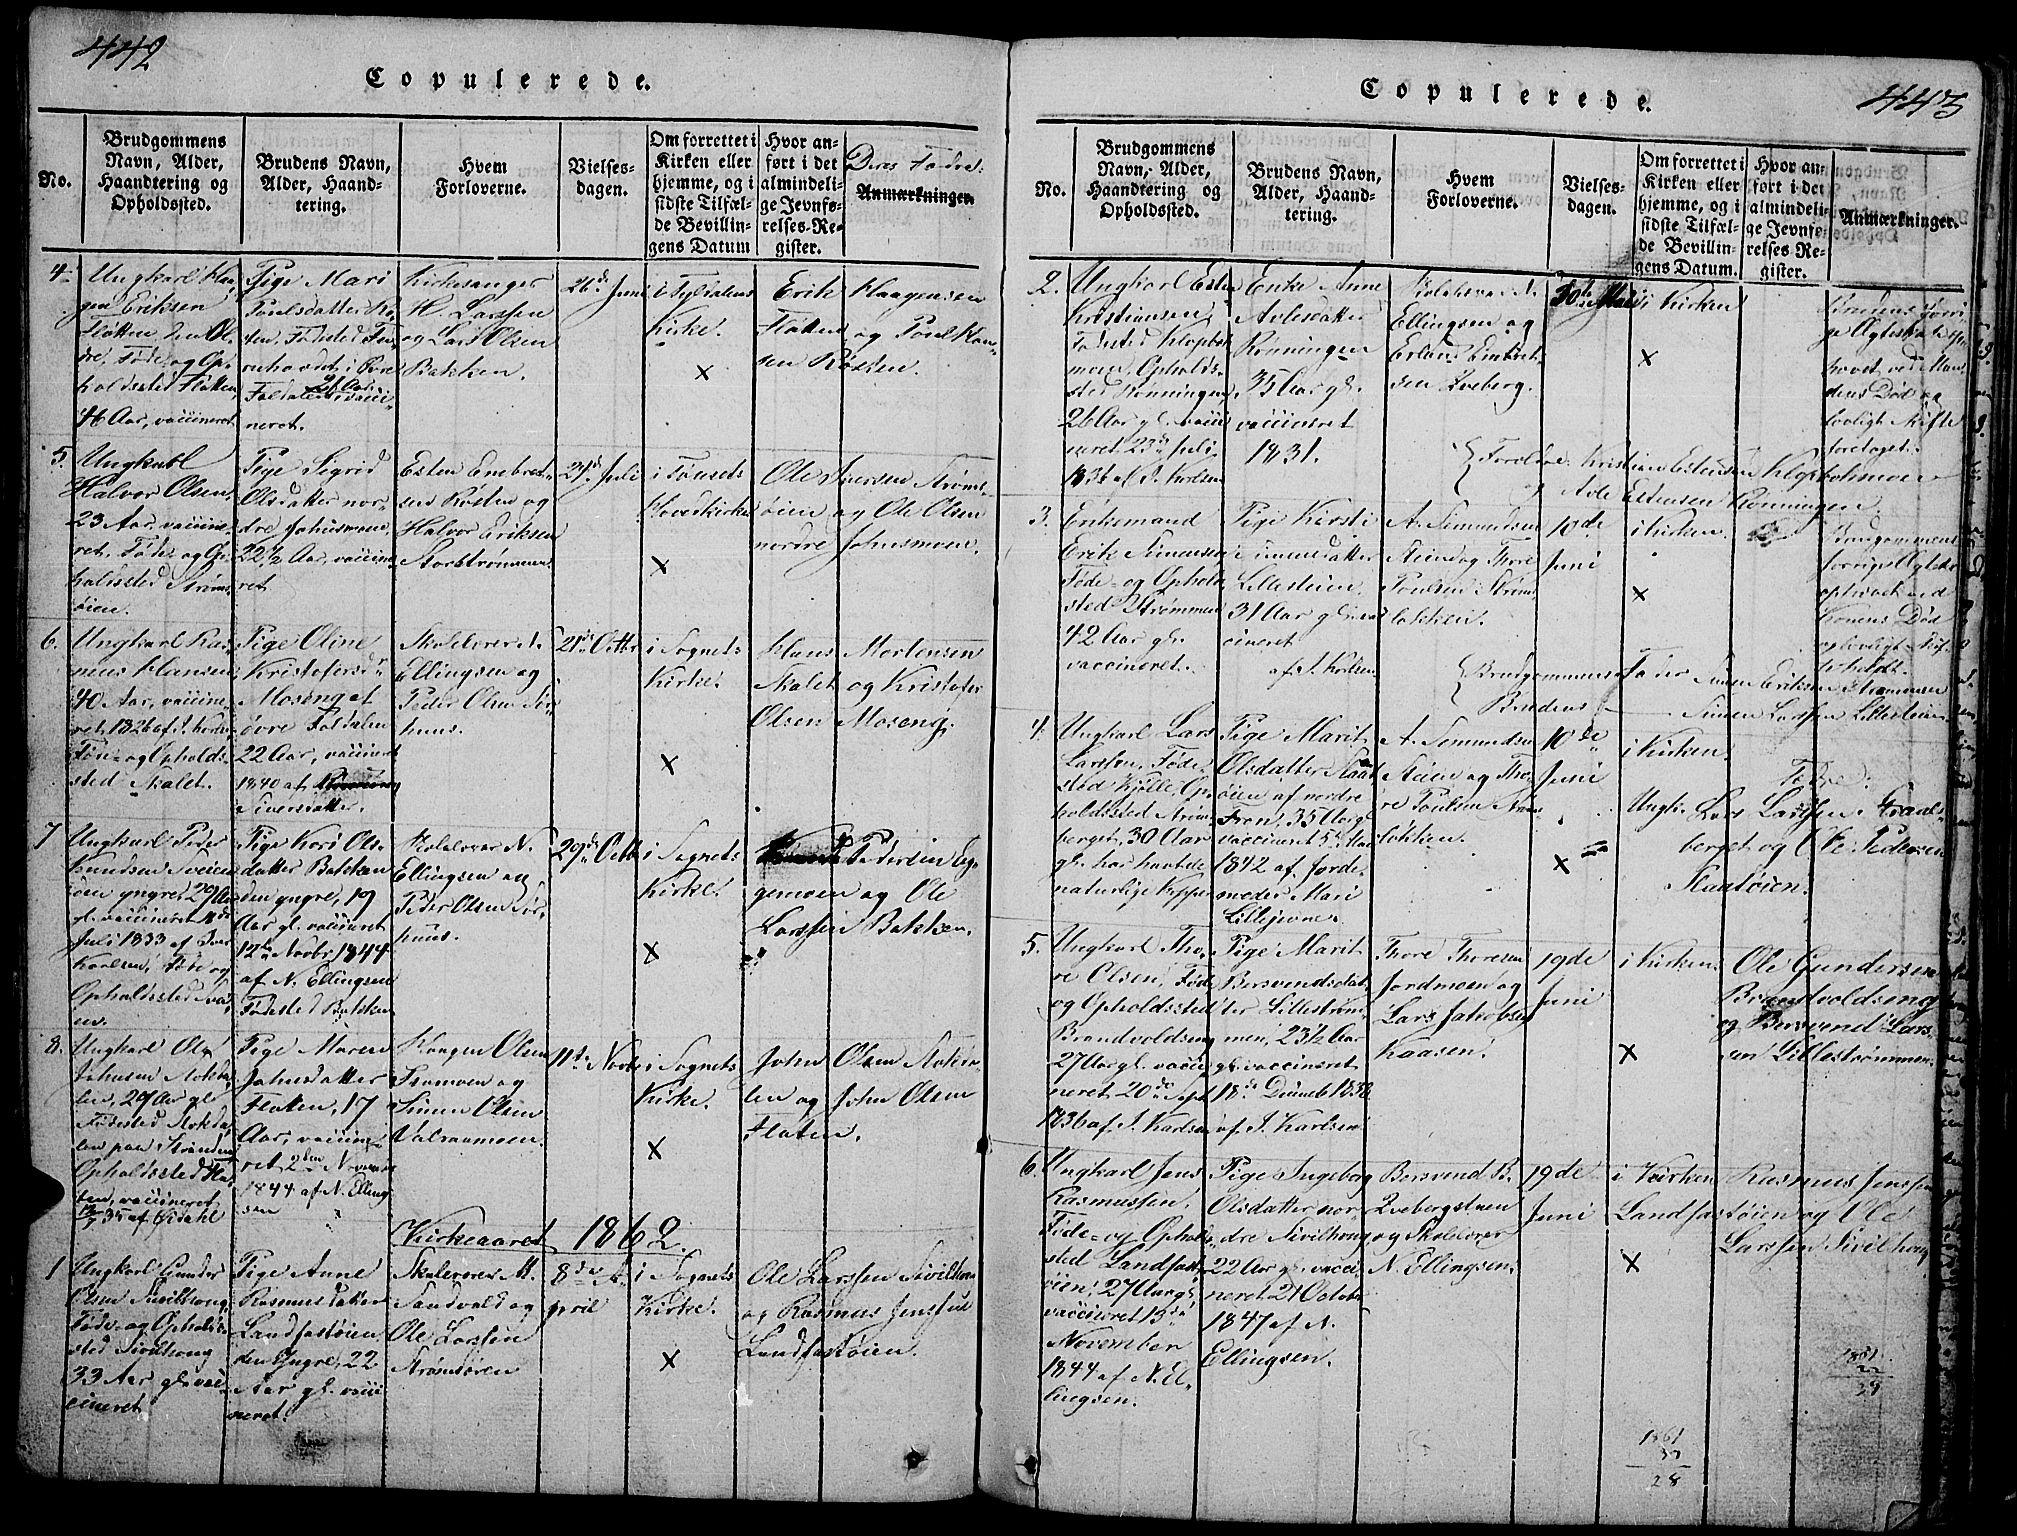 SAH, Tynset prestekontor, Klokkerbok nr. 2, 1814-1862, s. 442-443